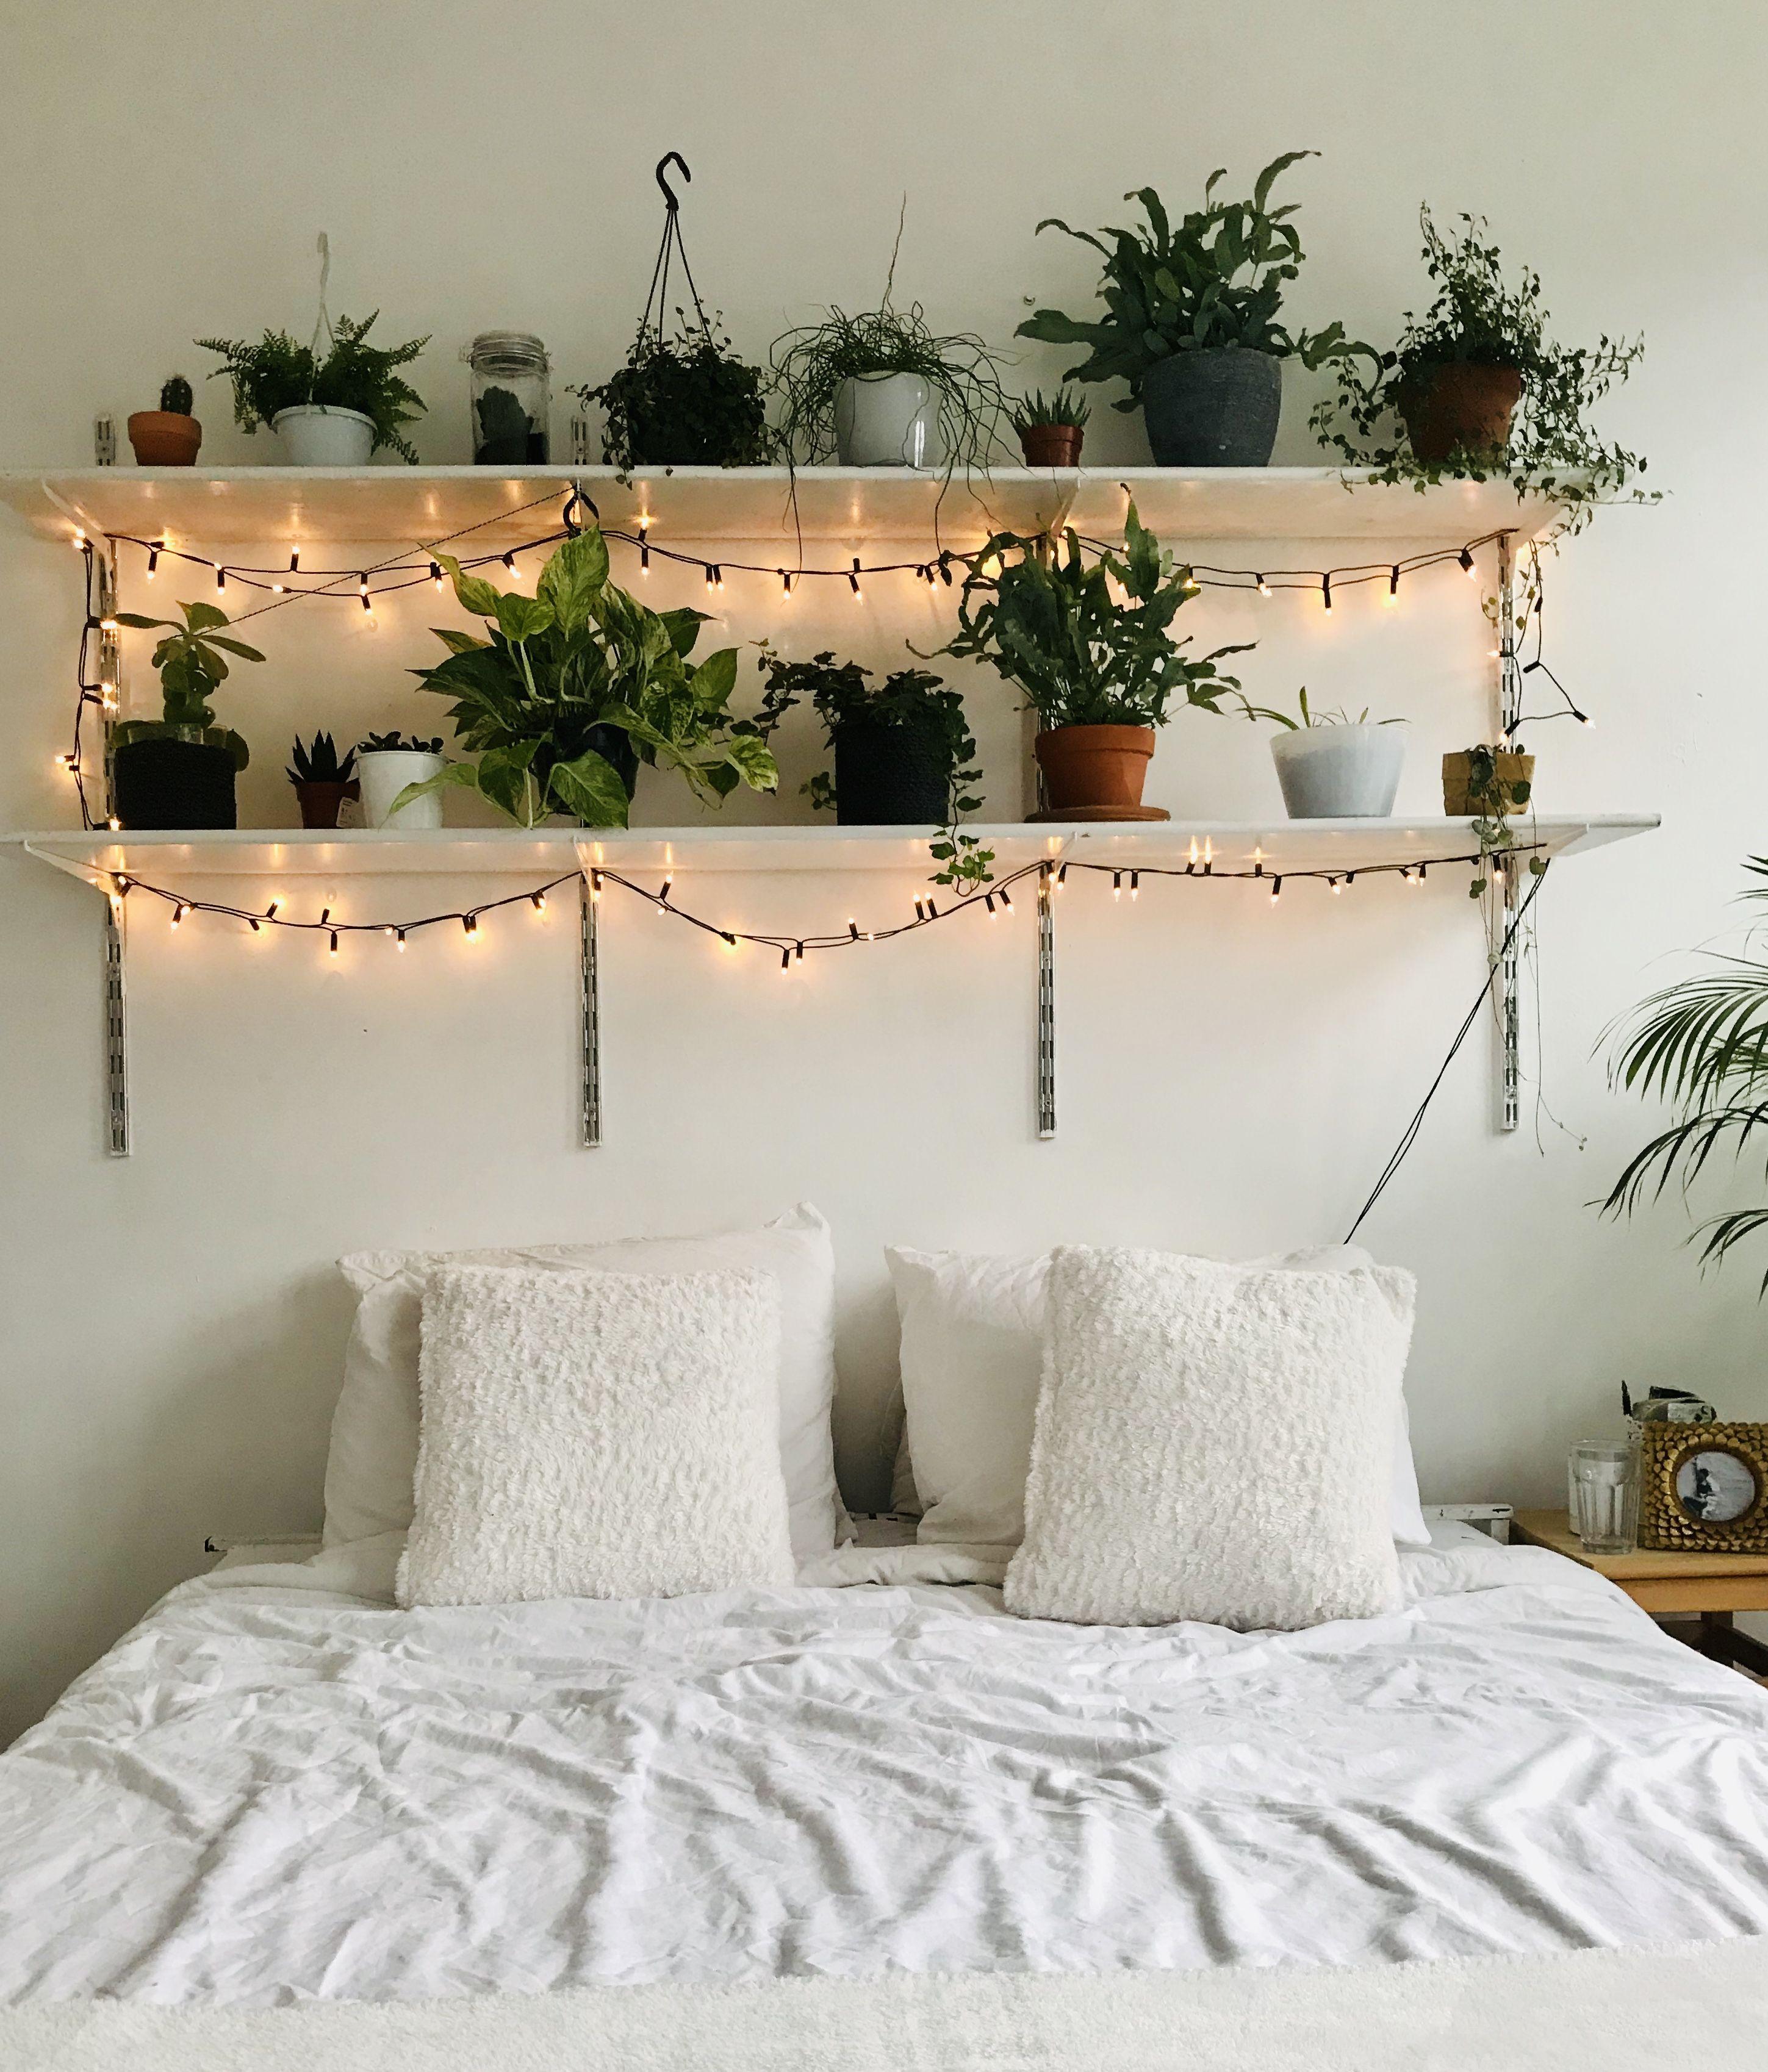 vsco room with plants